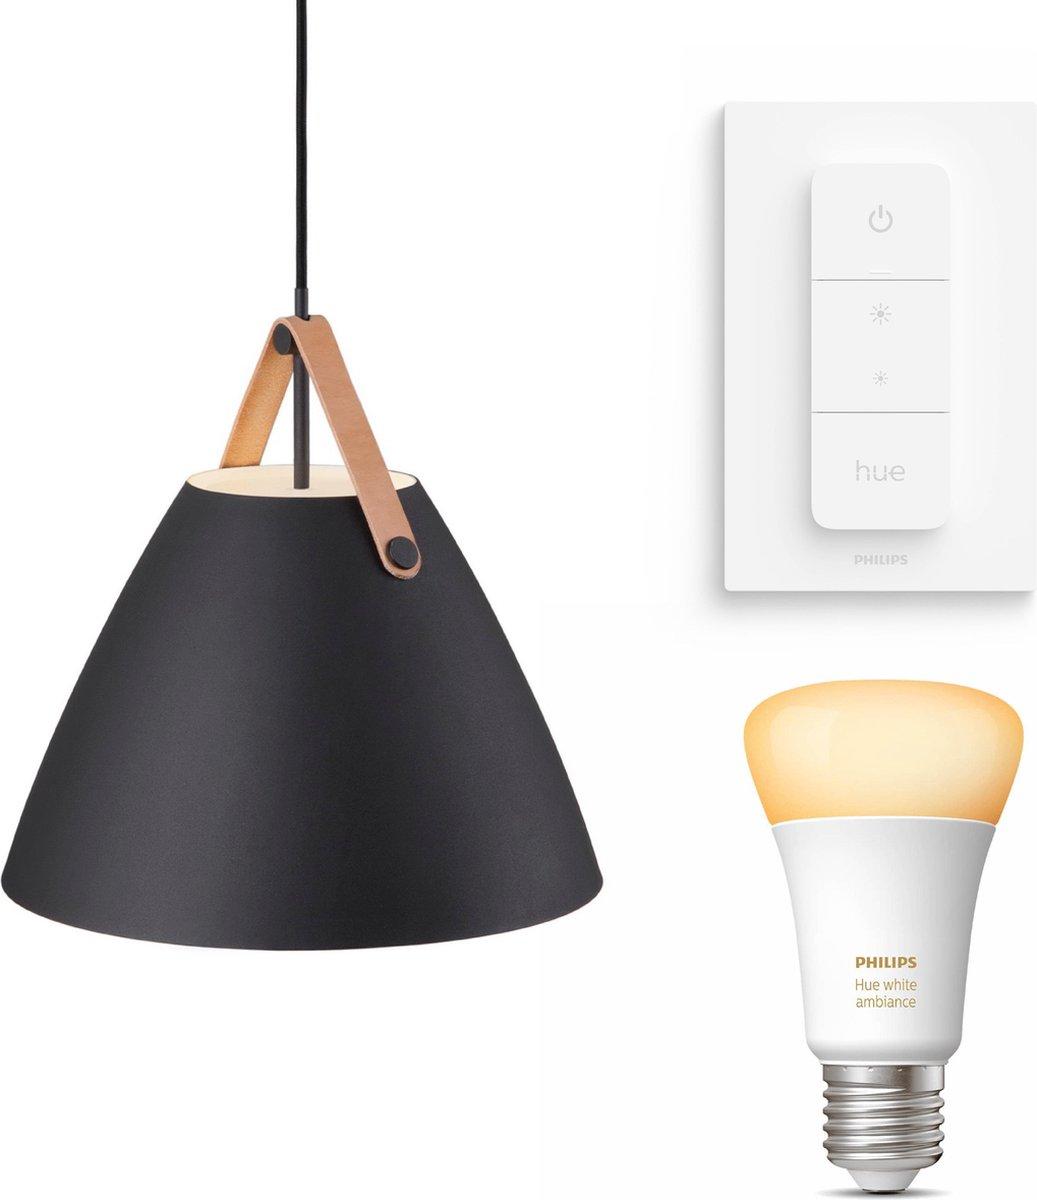 Nordlux Strap 36 hanglamp - LED - zwart - 1 lichtpunt - Incl. Philips Hue White Ambiance E27 & dimmer